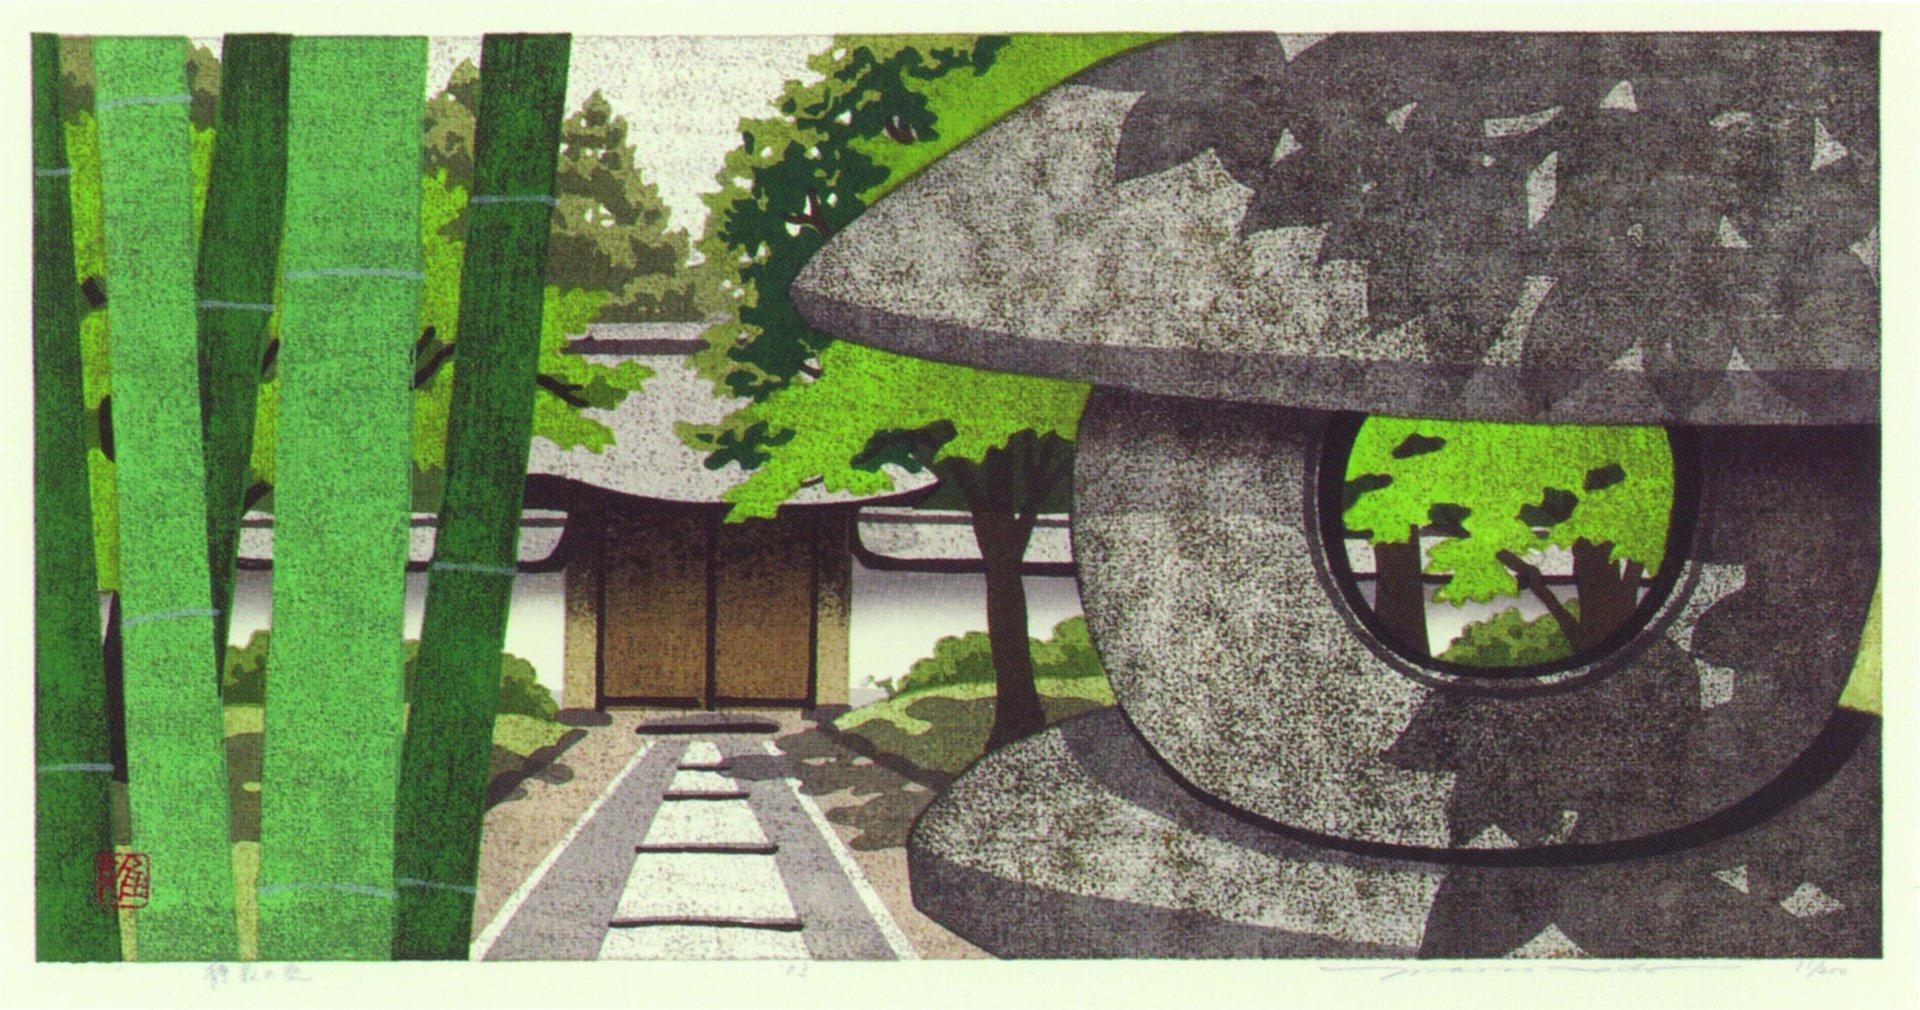 2007-4-3-tranquil-garden.jpg